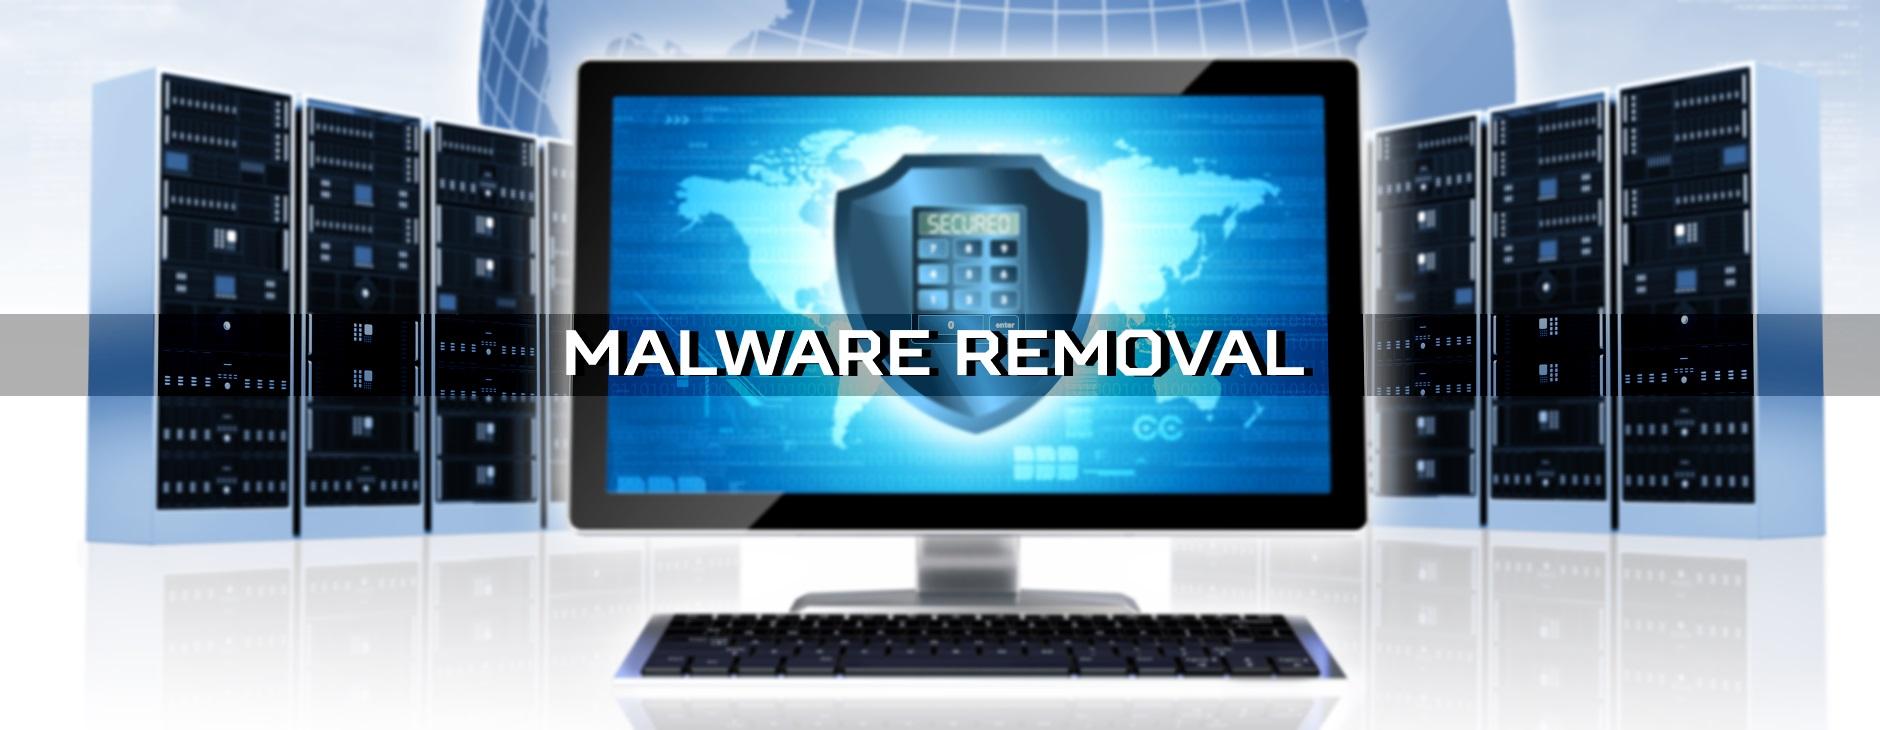 Malware-4.jpg